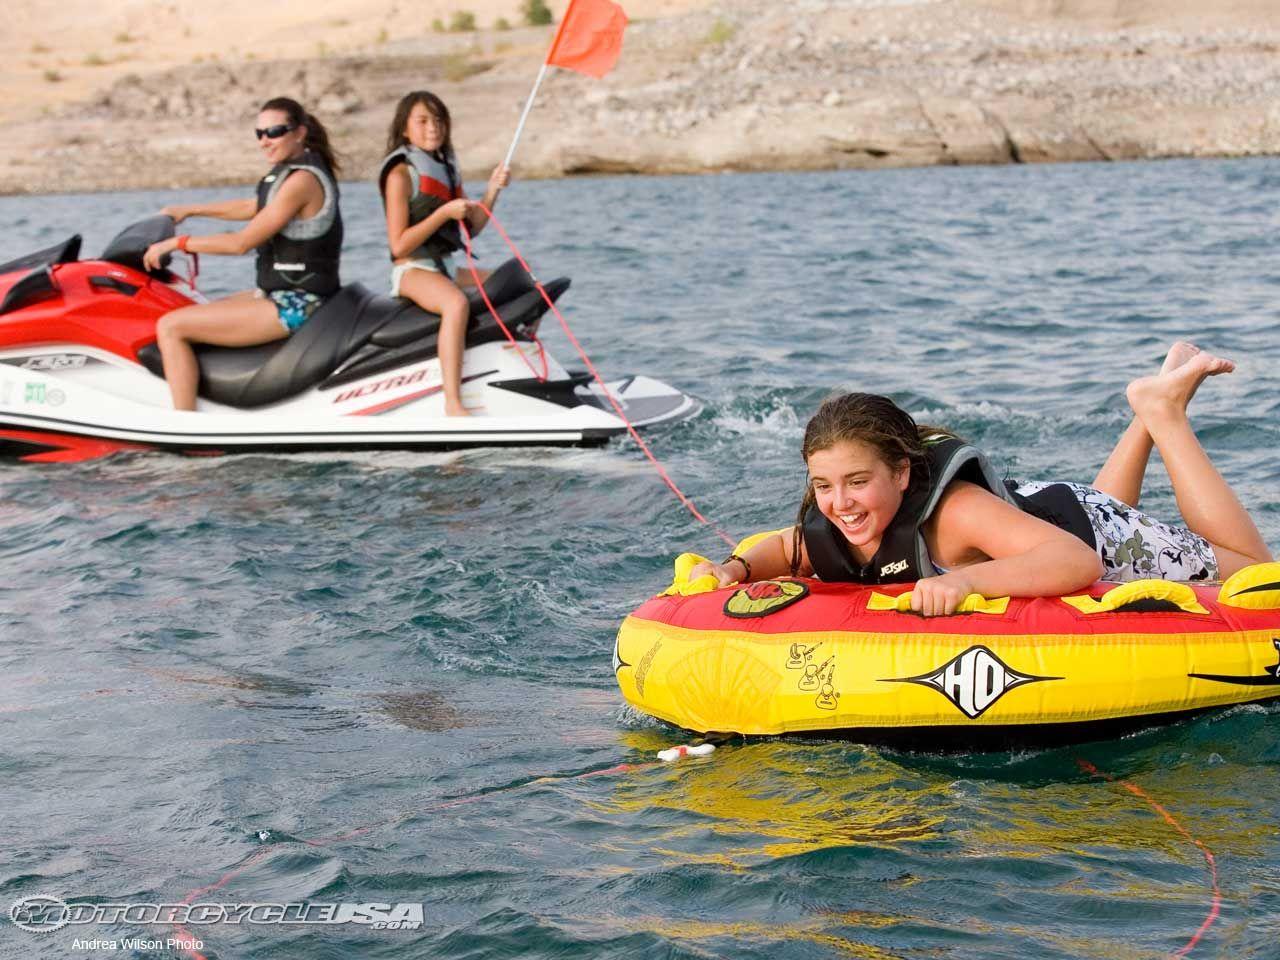 Do you think the kids enjoy tubing behind the jet ski